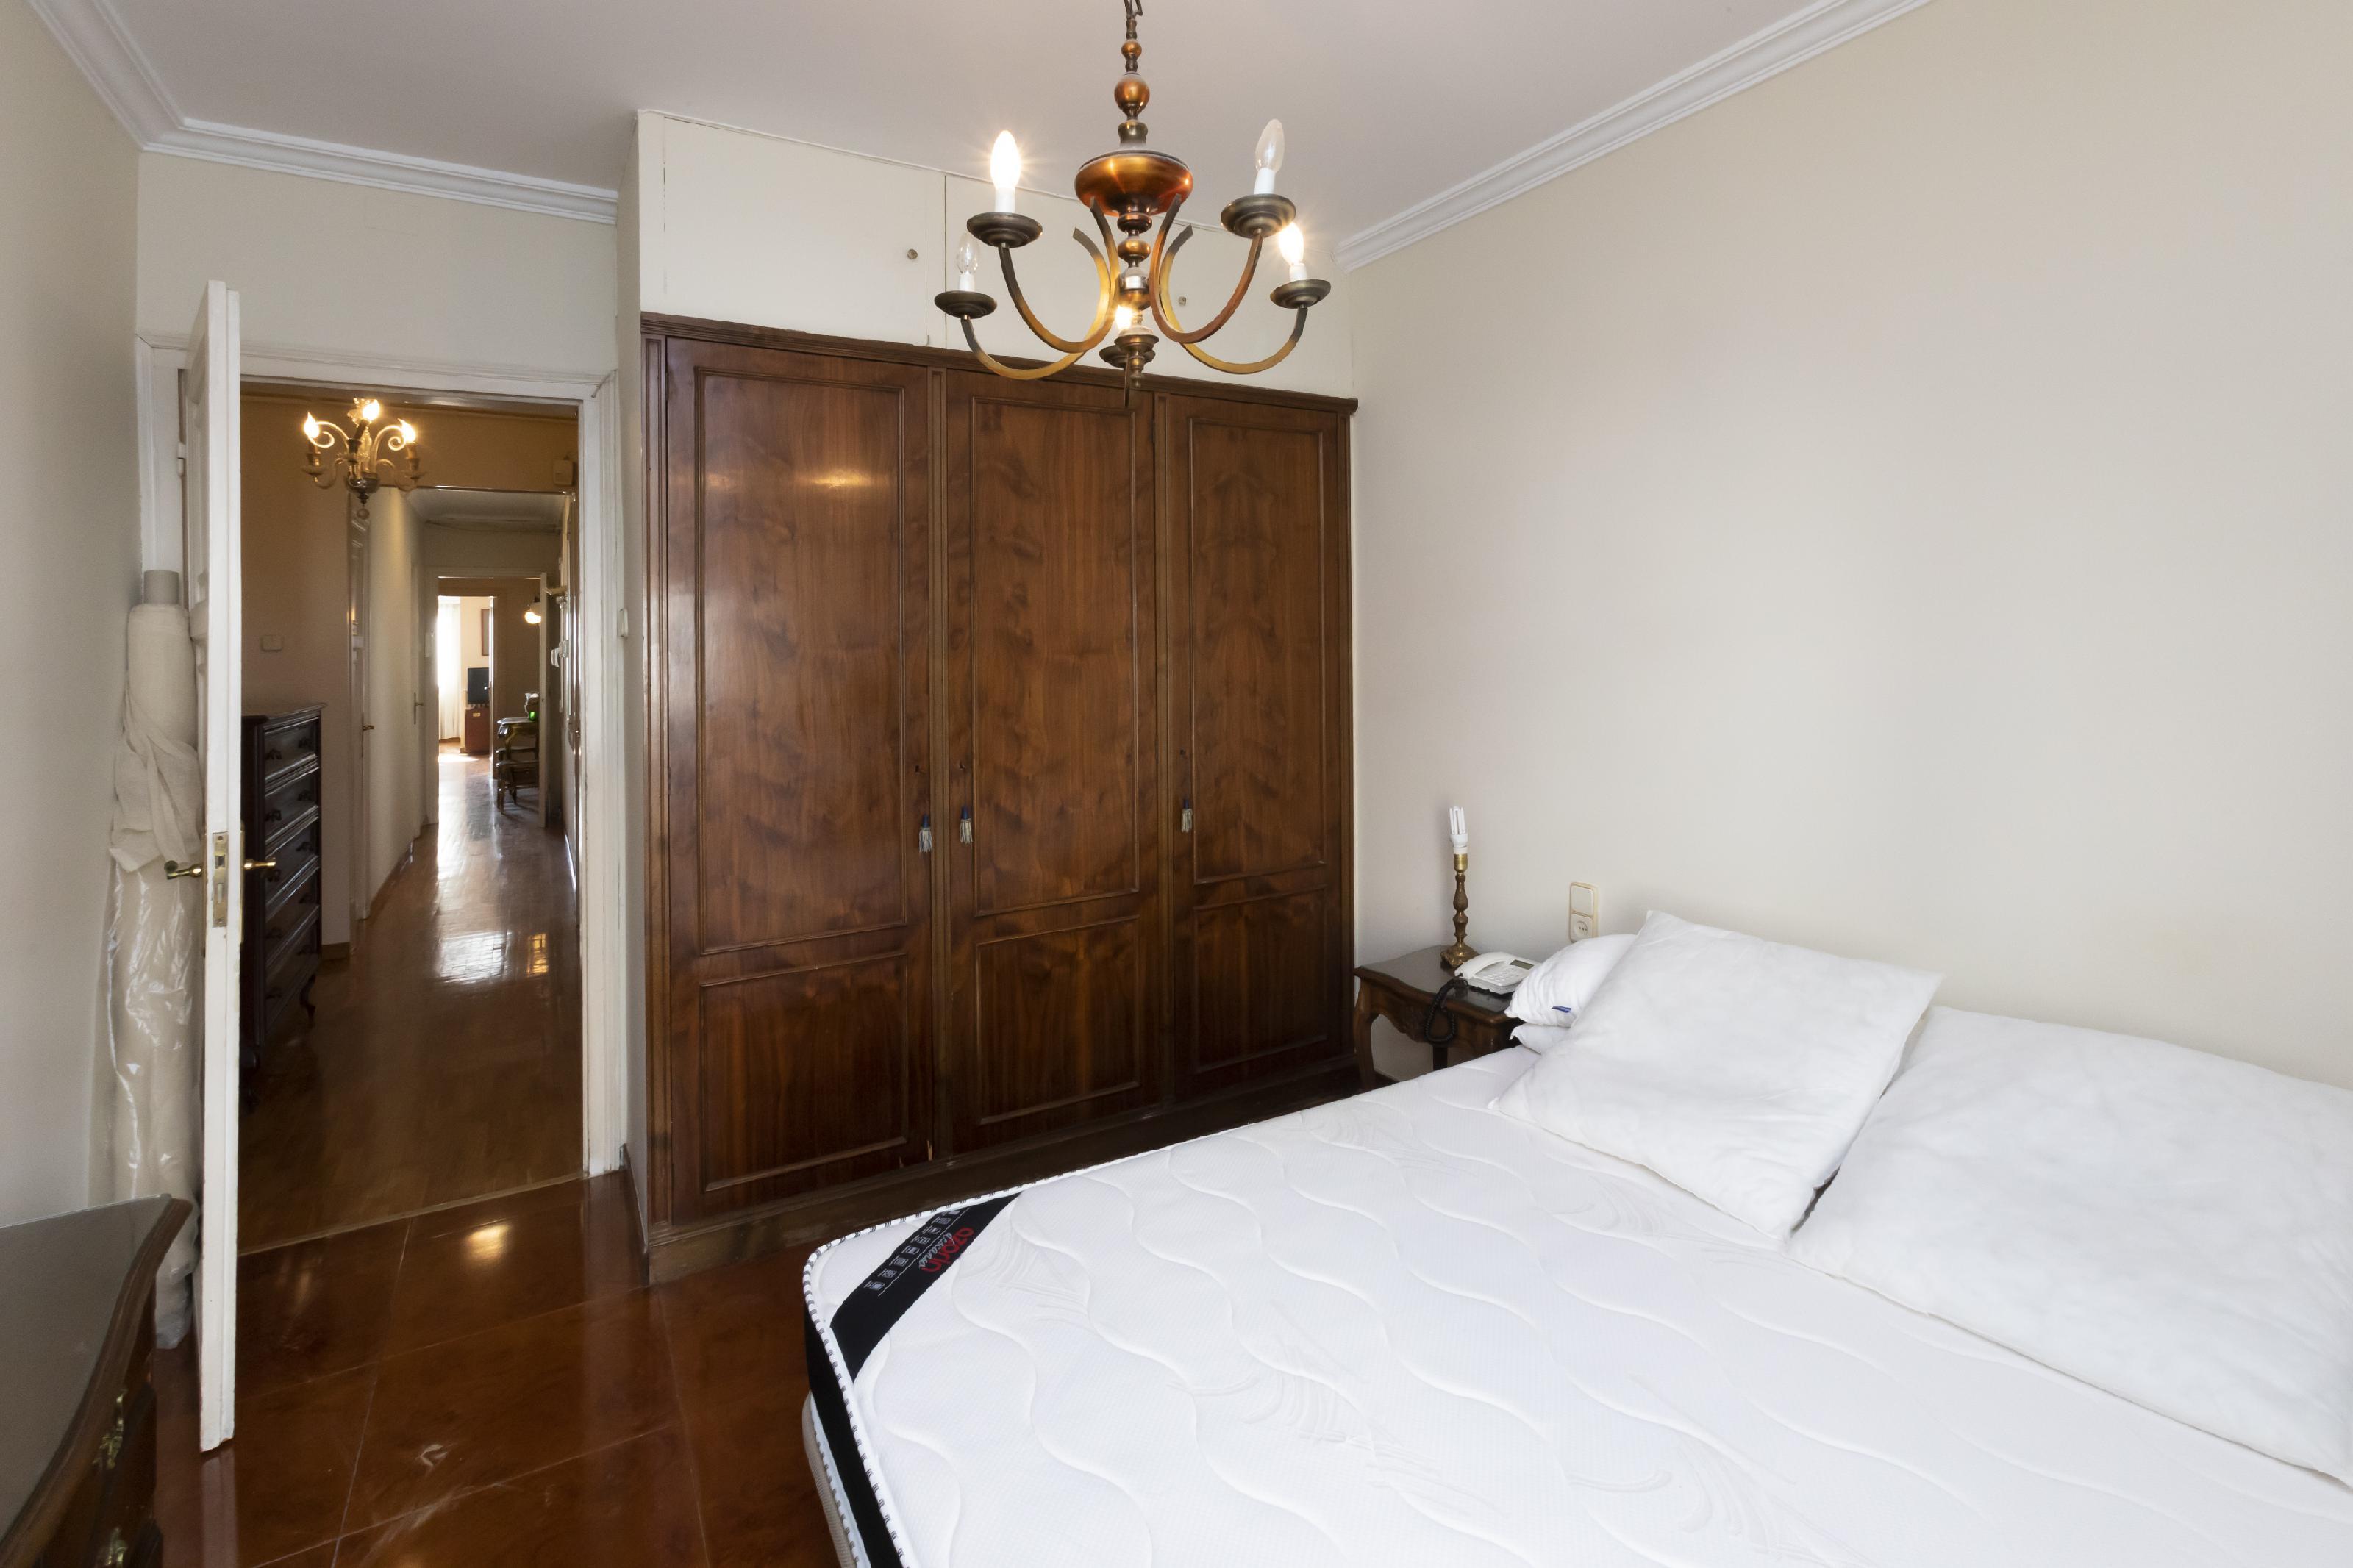 247097 Flat for sale in Sarrià-Sant Gervasi, Sant Gervasi-Galvany 20